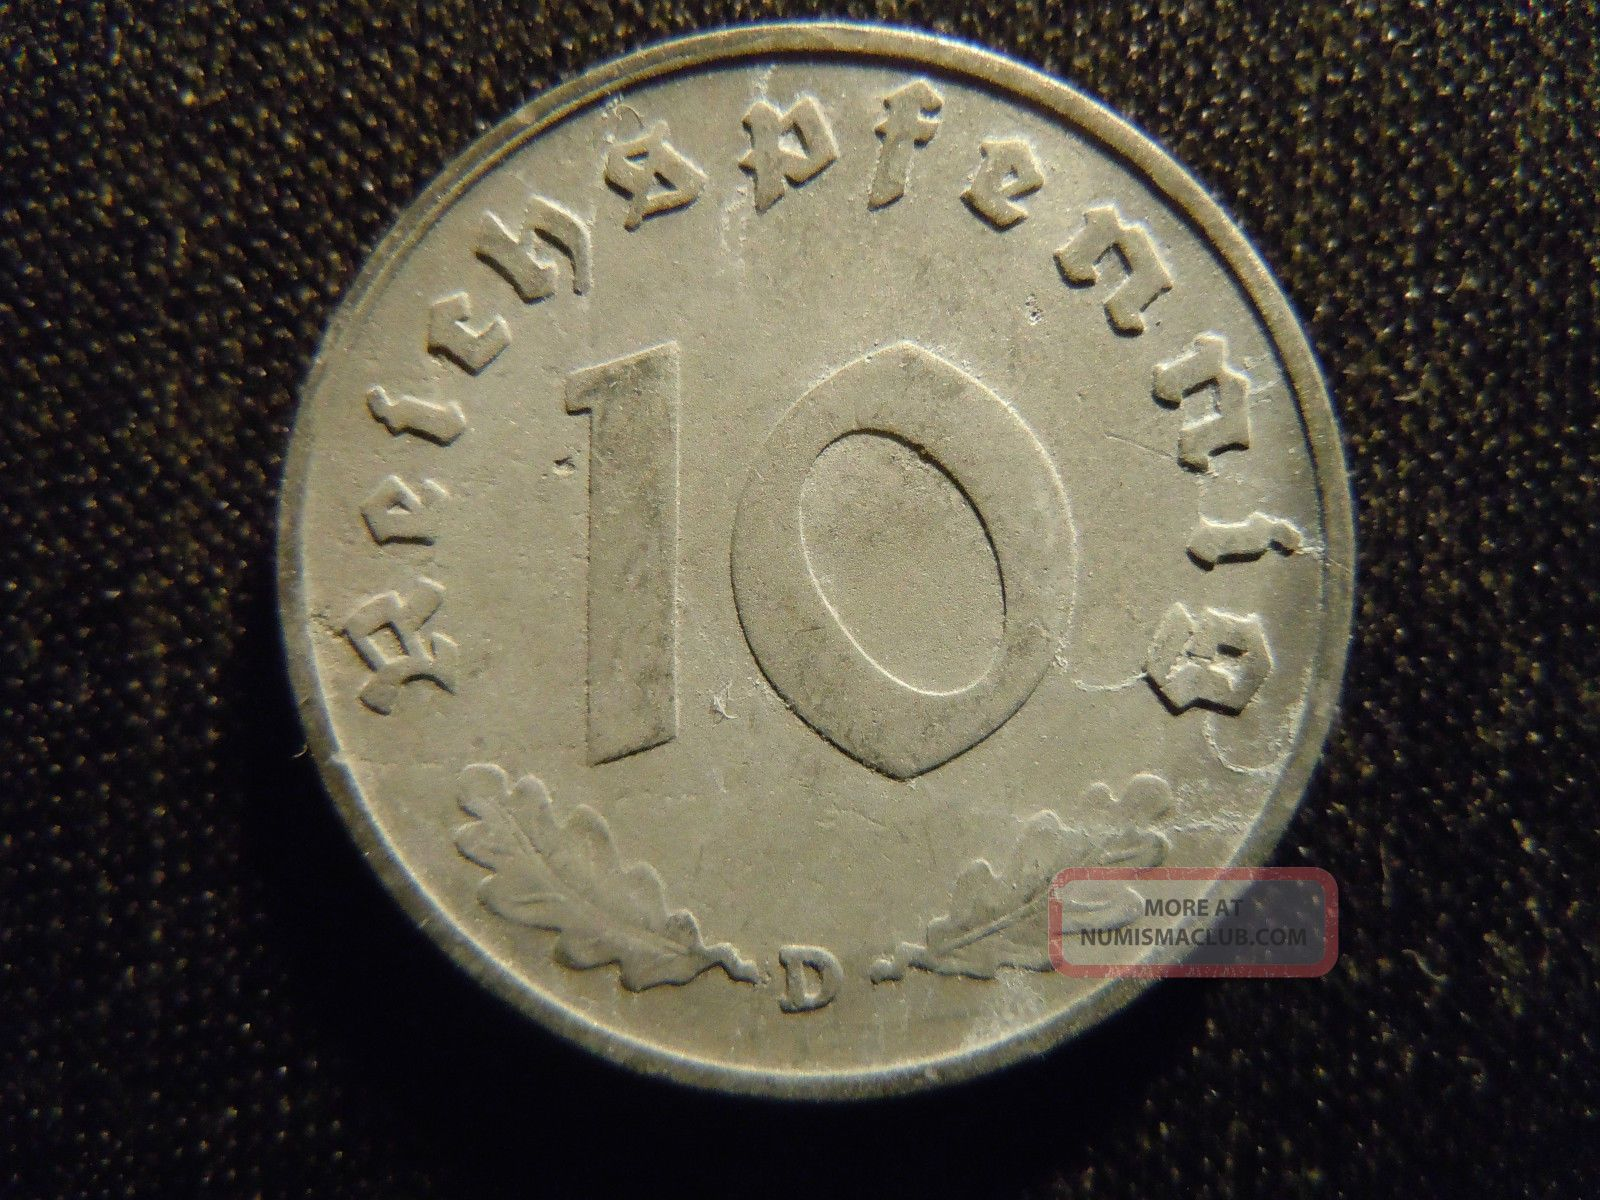 1940 D German Ww2 10 Reichspfennig Germany Nazi Coin Swastika World Ab